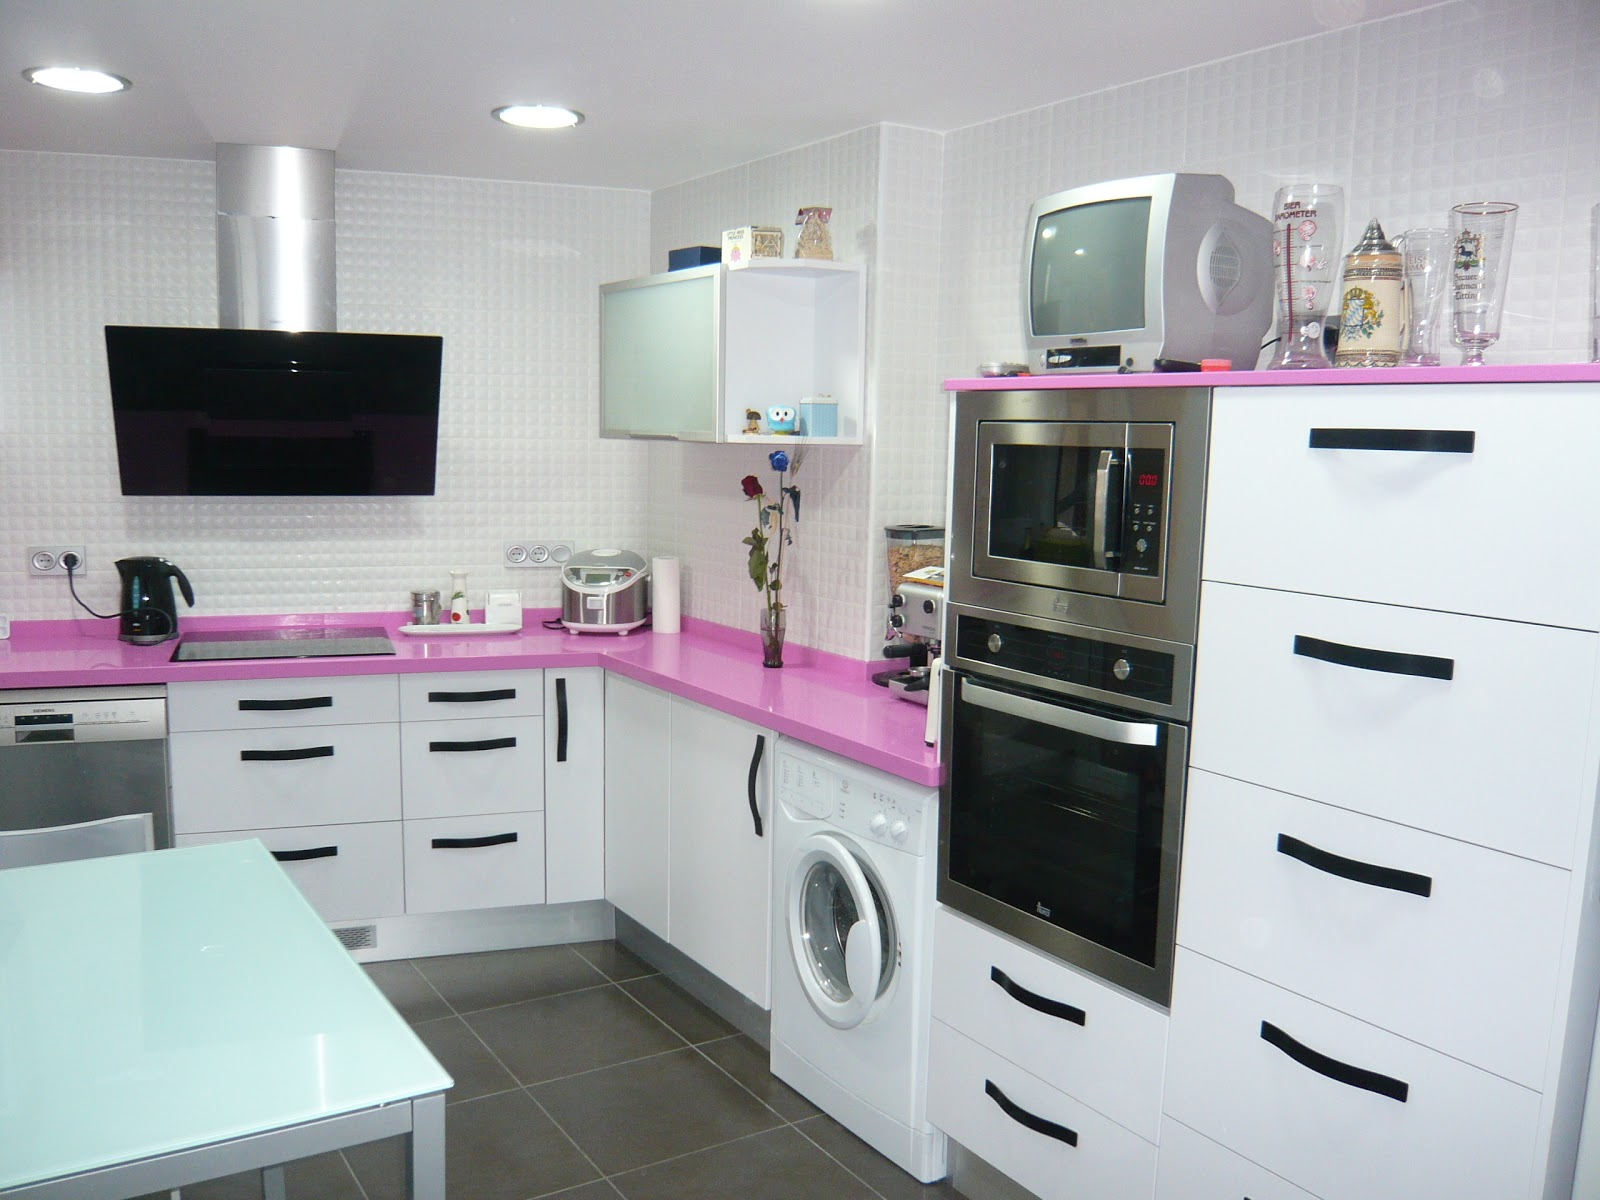 Reuscuina muebles de cocina en formica blanca mate - Cocina blanca mate ...